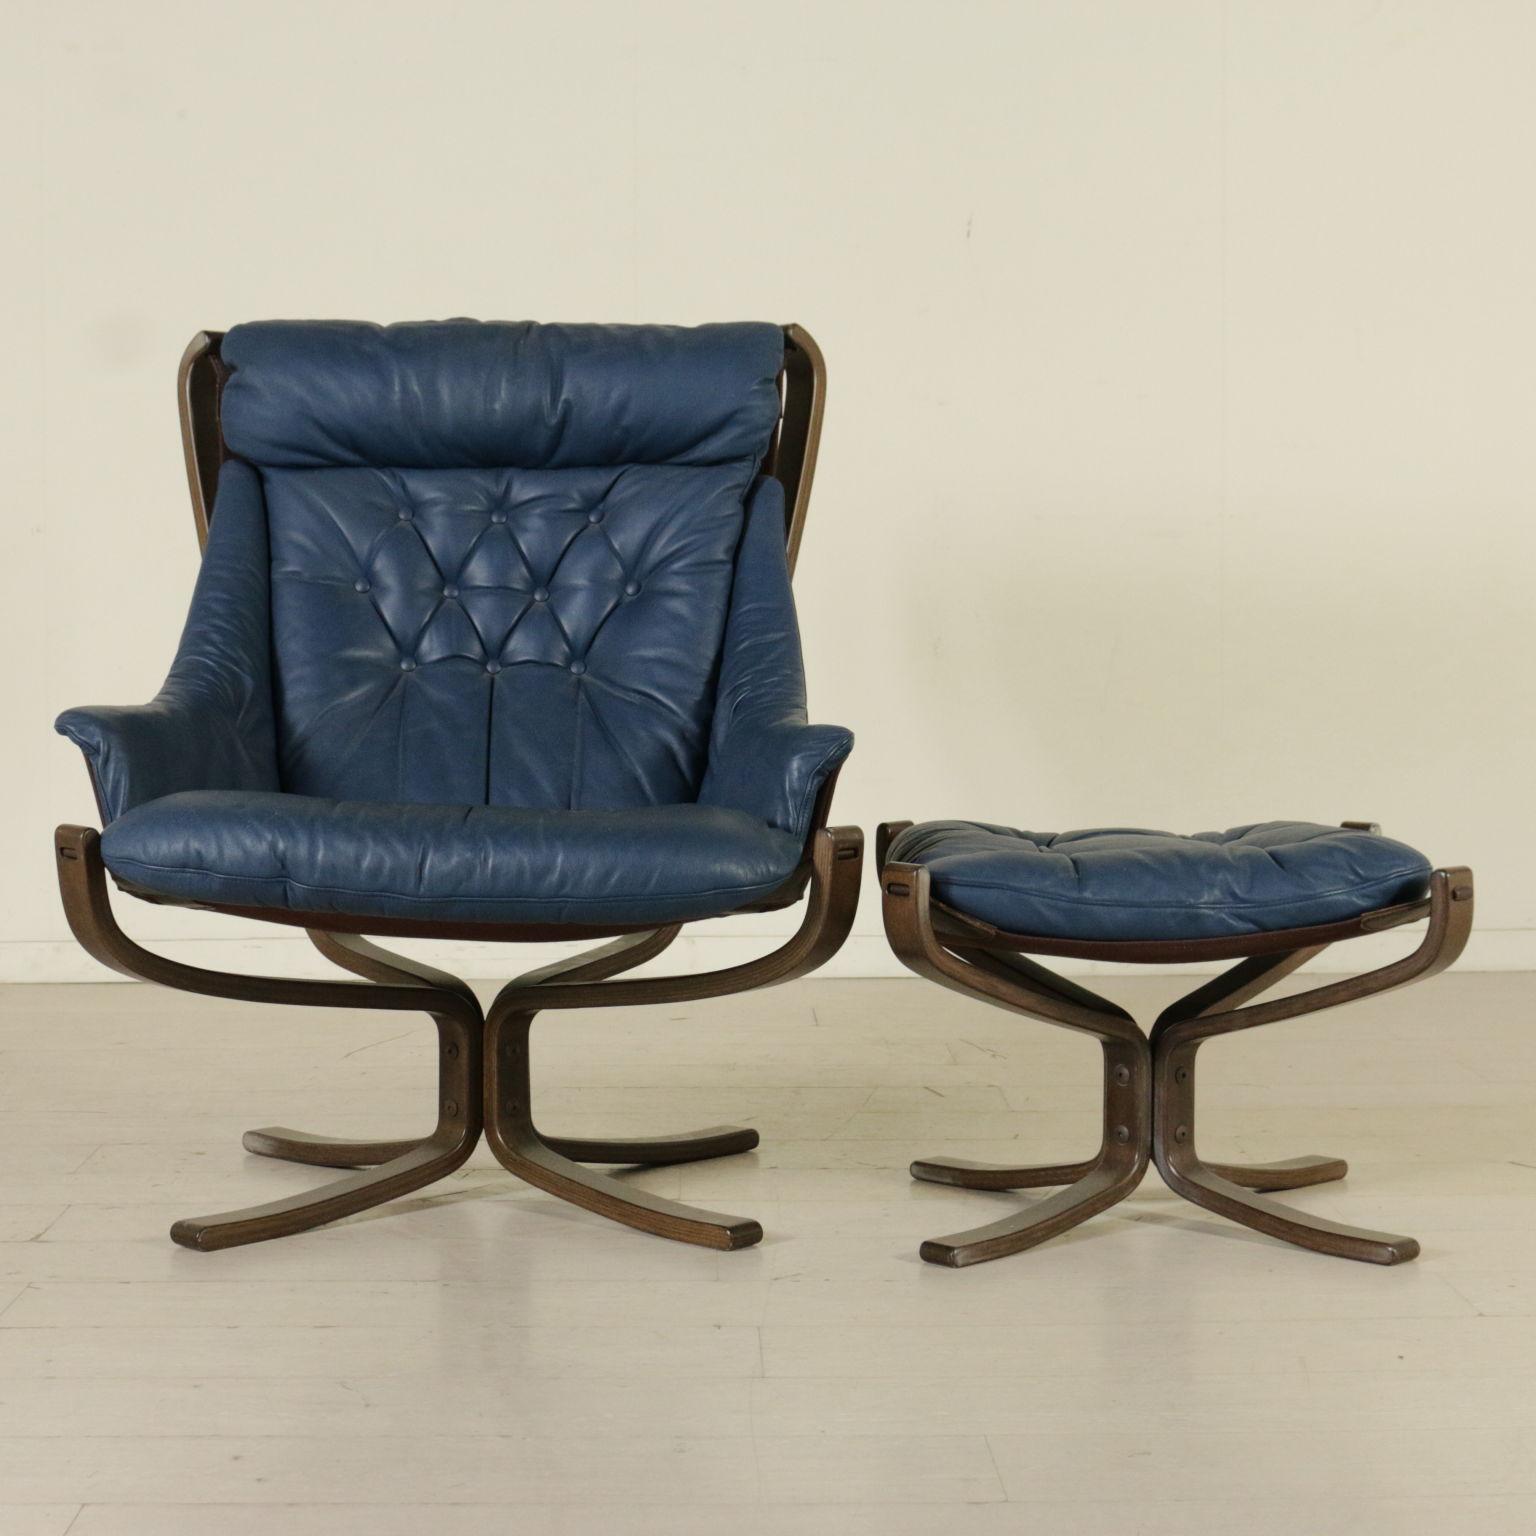 armchair designed for frau armchairs modern design. Black Bedroom Furniture Sets. Home Design Ideas